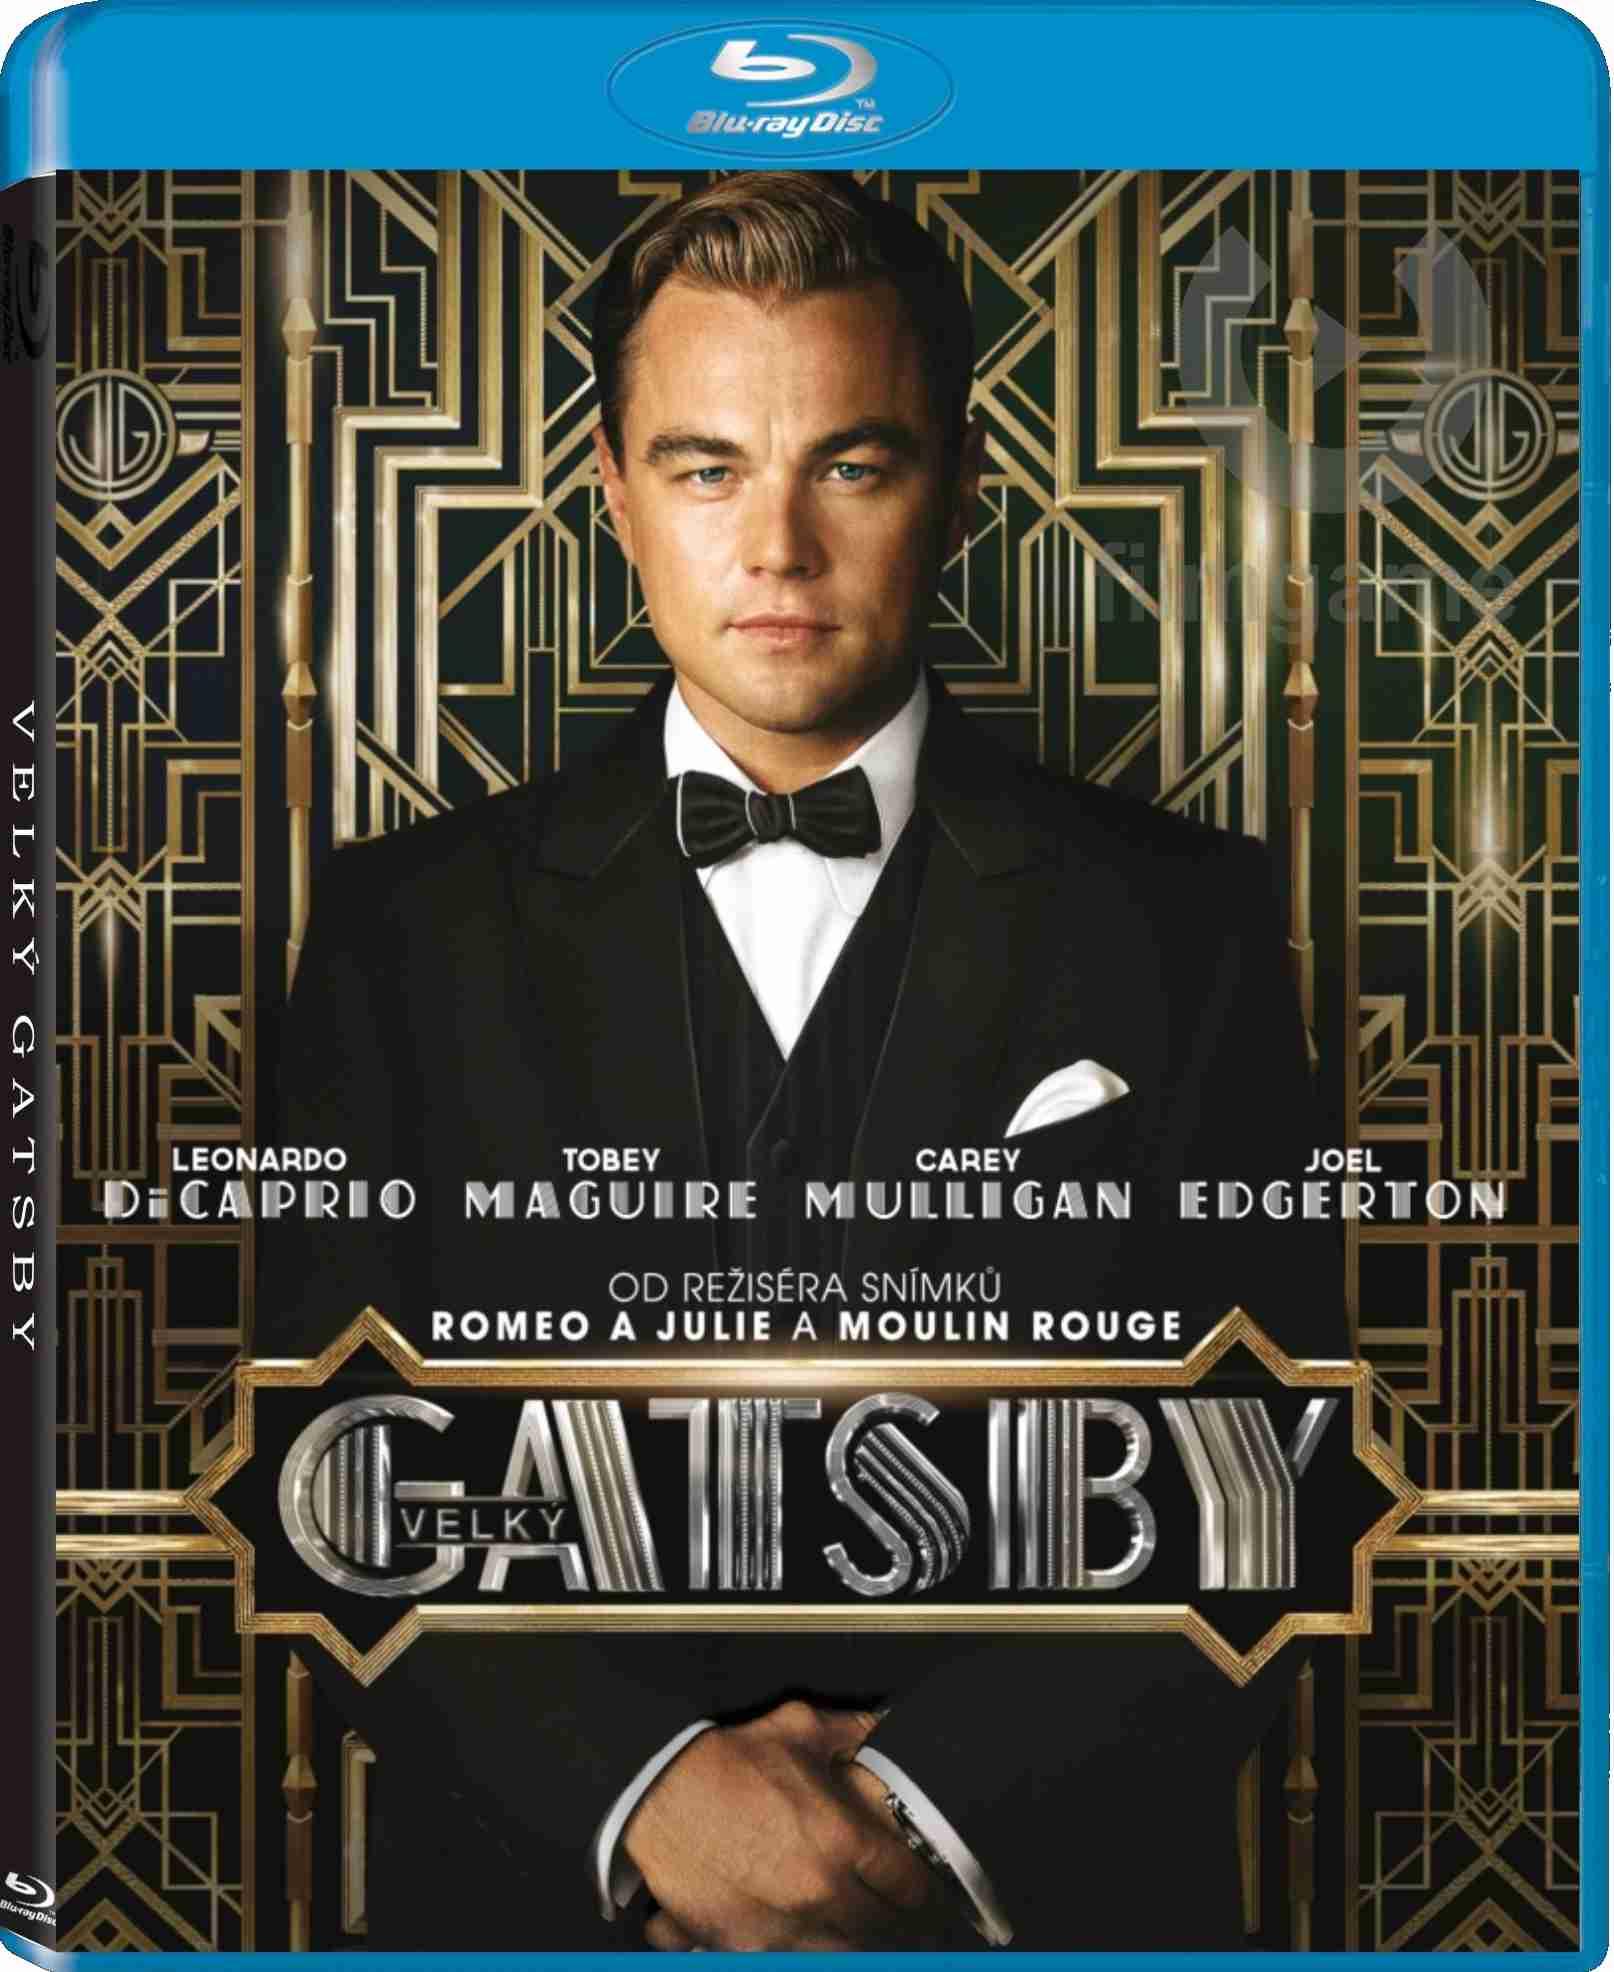 Velký Gatsby (2013) - Blu-ray